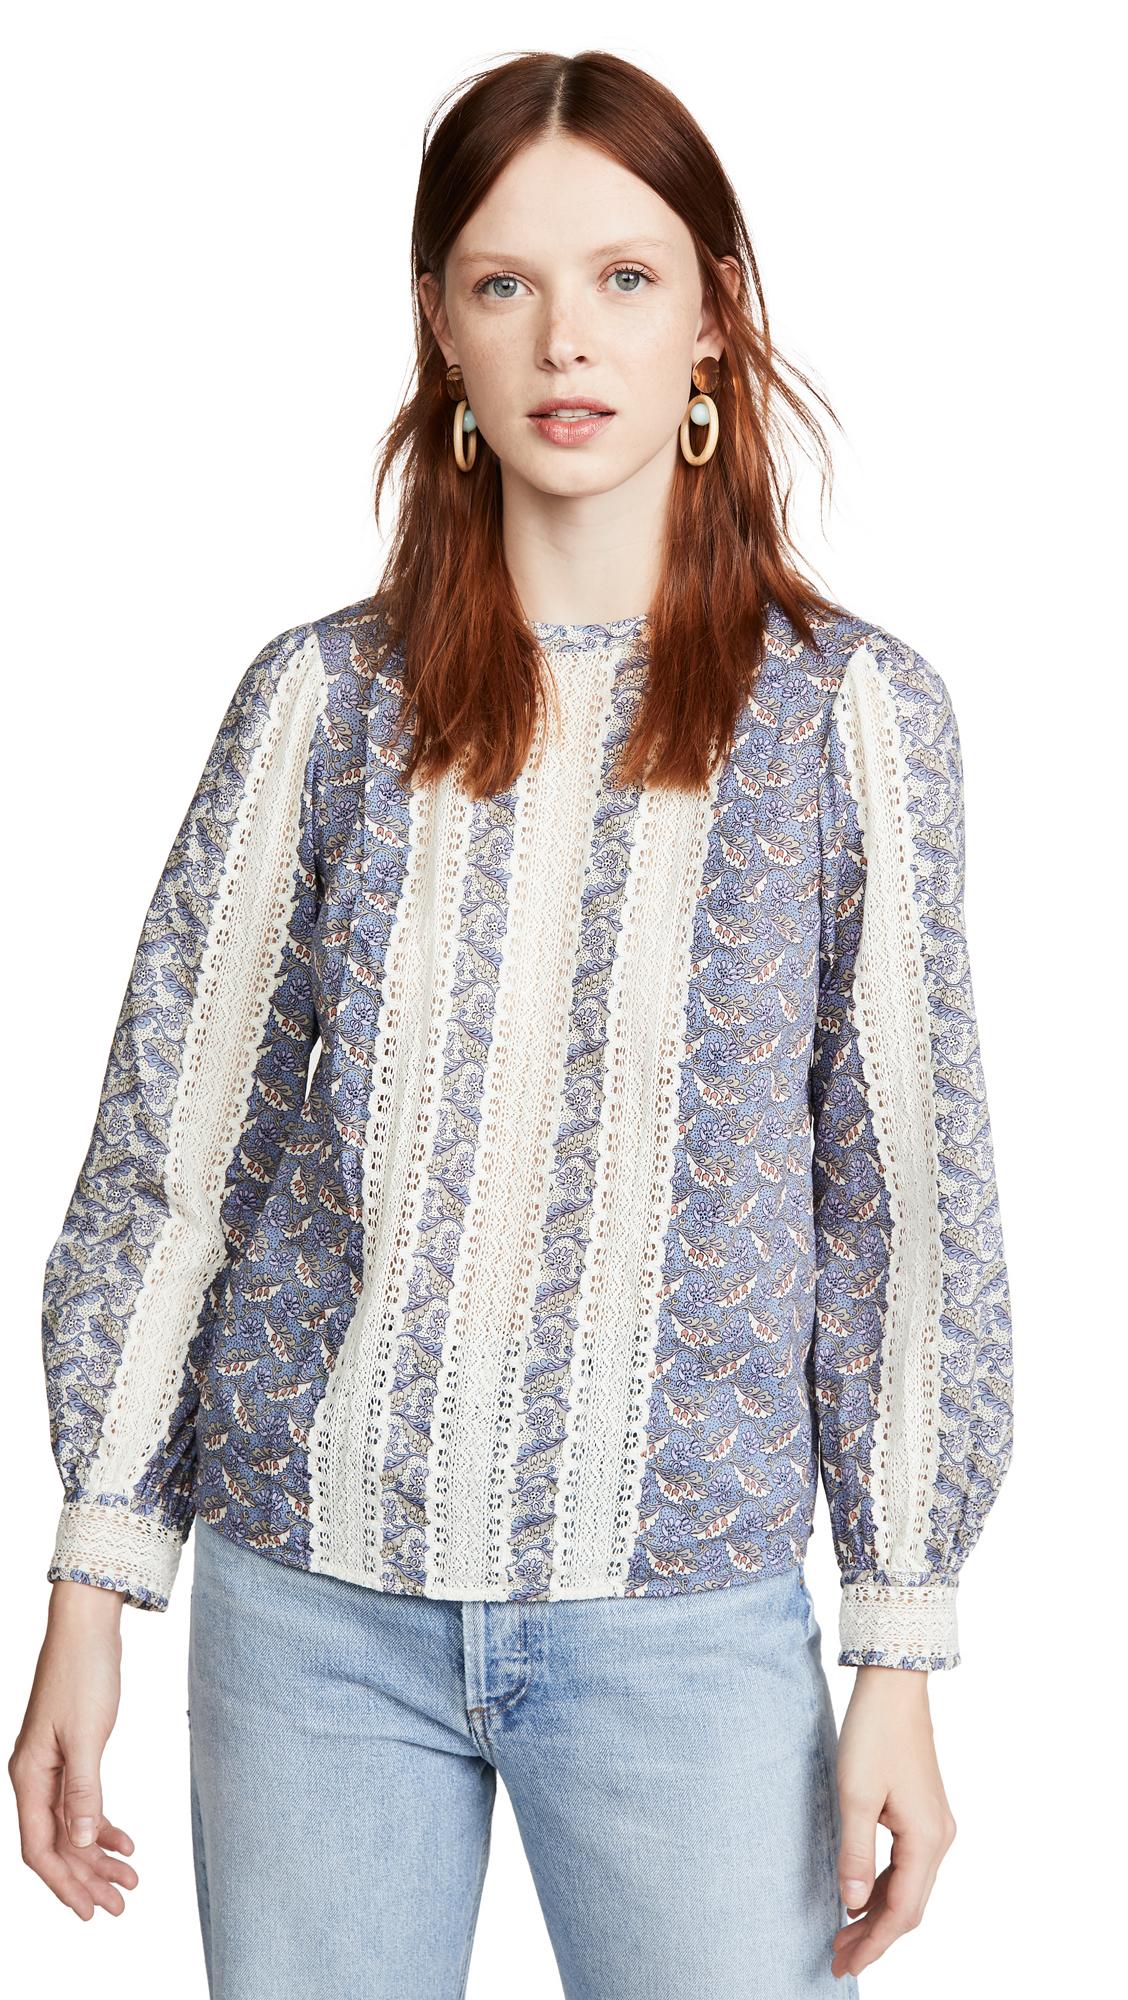 La Vie Rebecca Taylor Long Sleeve Woodblock Lace Top - 50% Off Sale